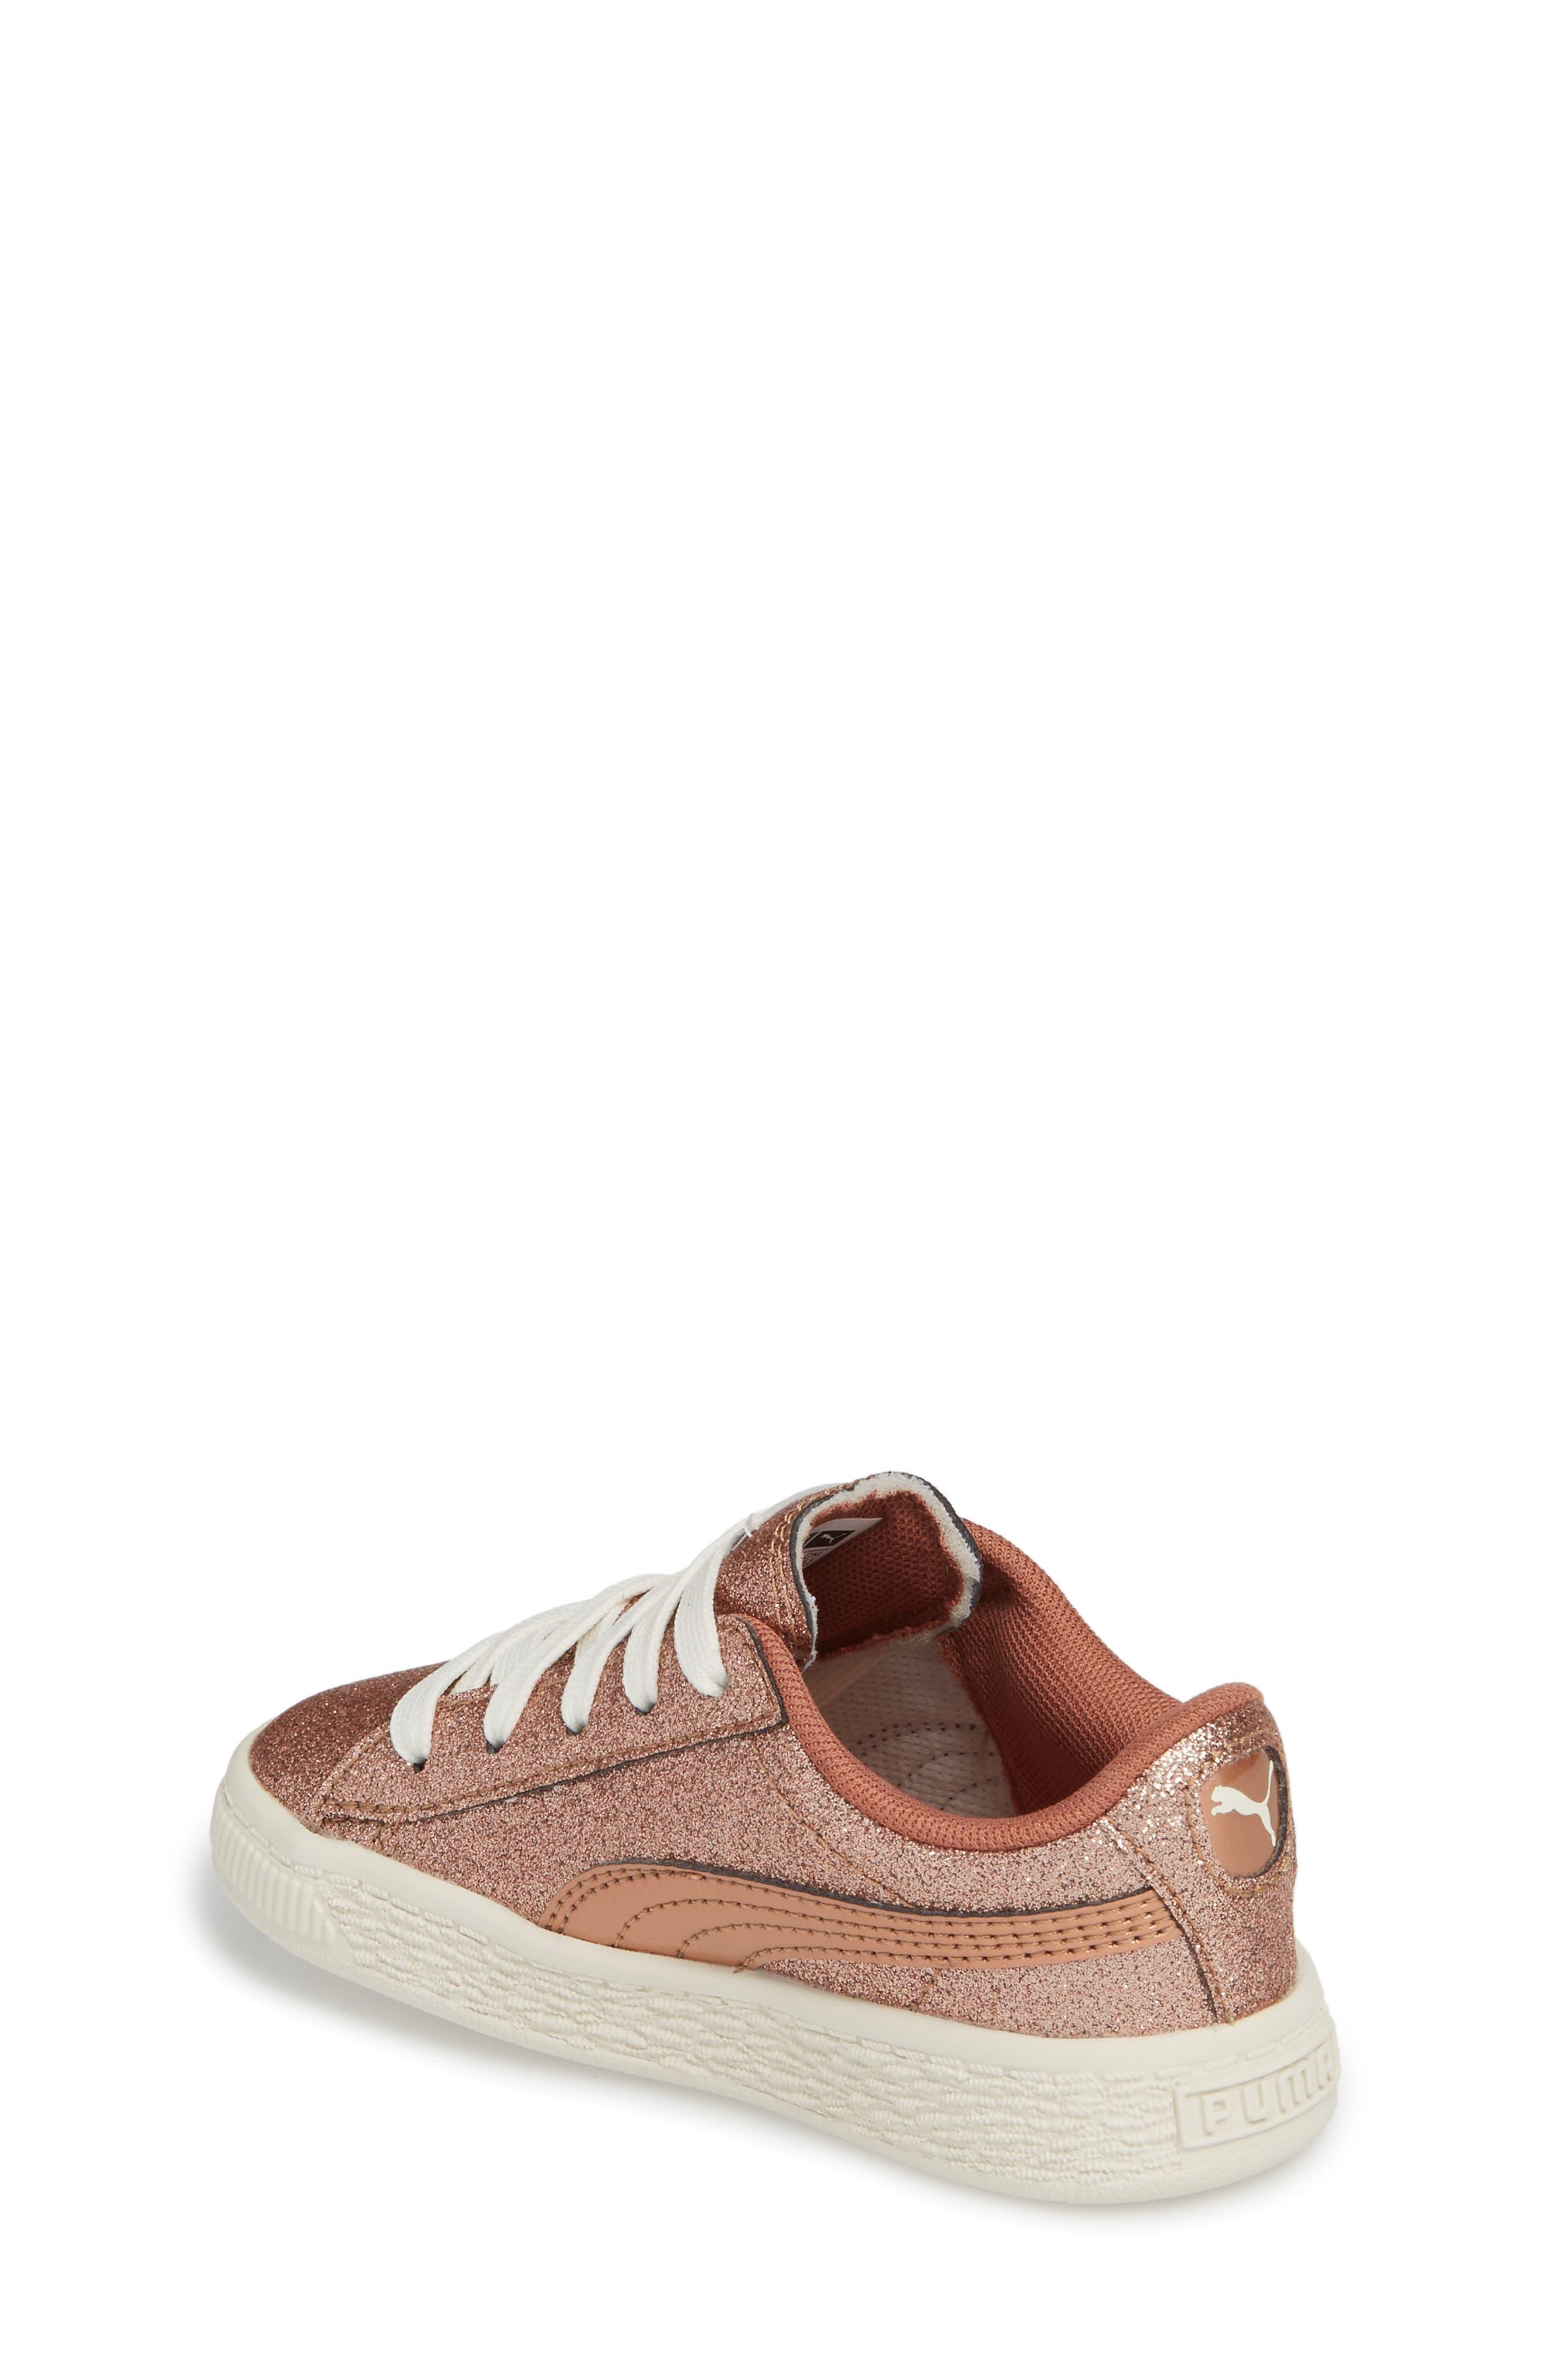 Basket Holiday Glitz Jr. Sneaker,                             Alternate thumbnail 2, color,                             Copper Rose